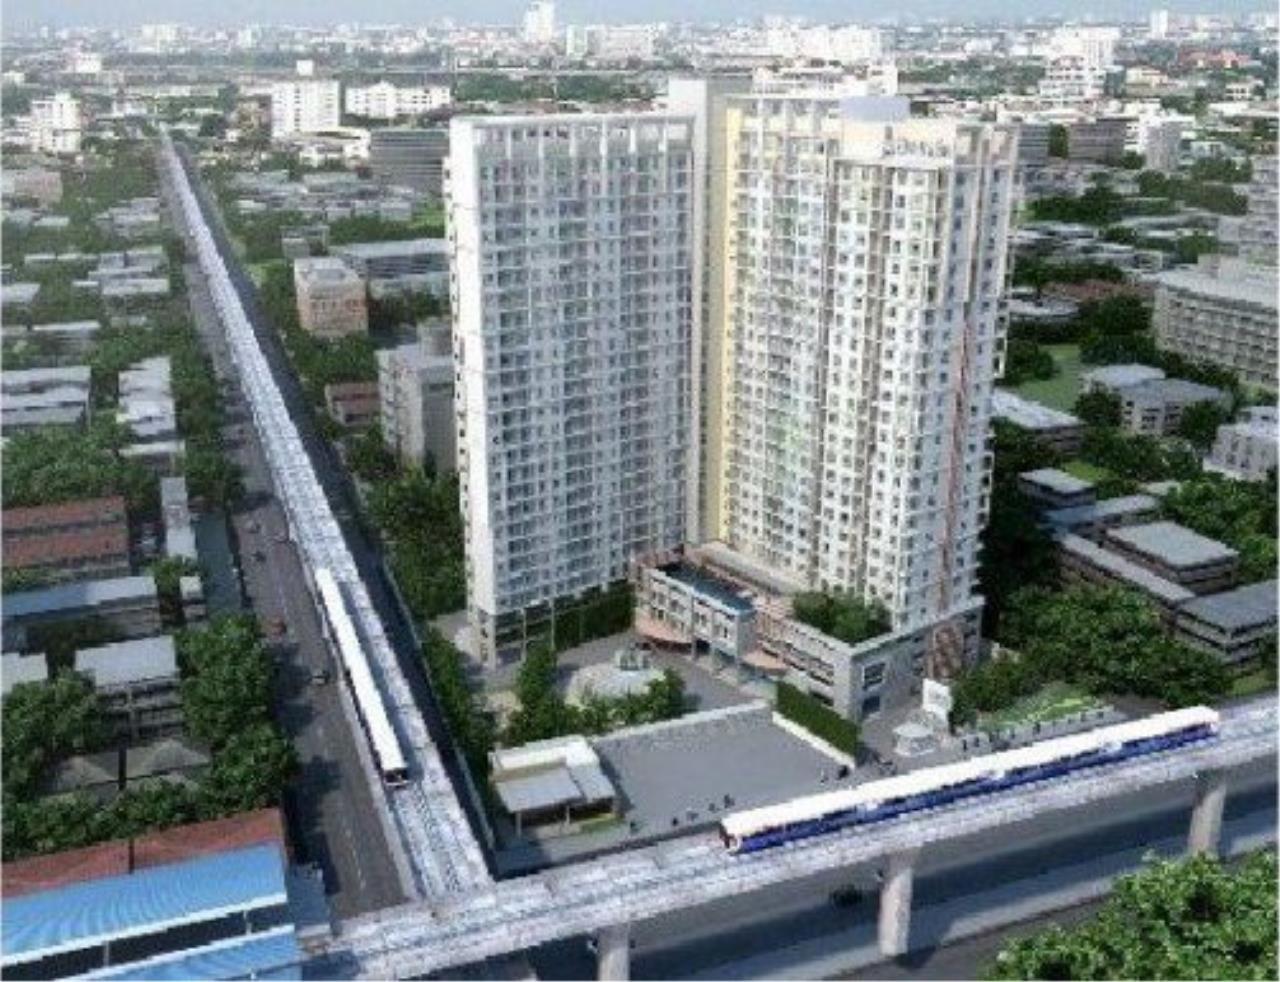 richpark bangson station condo bangkok 5119200aef23779f3d0007ce_full